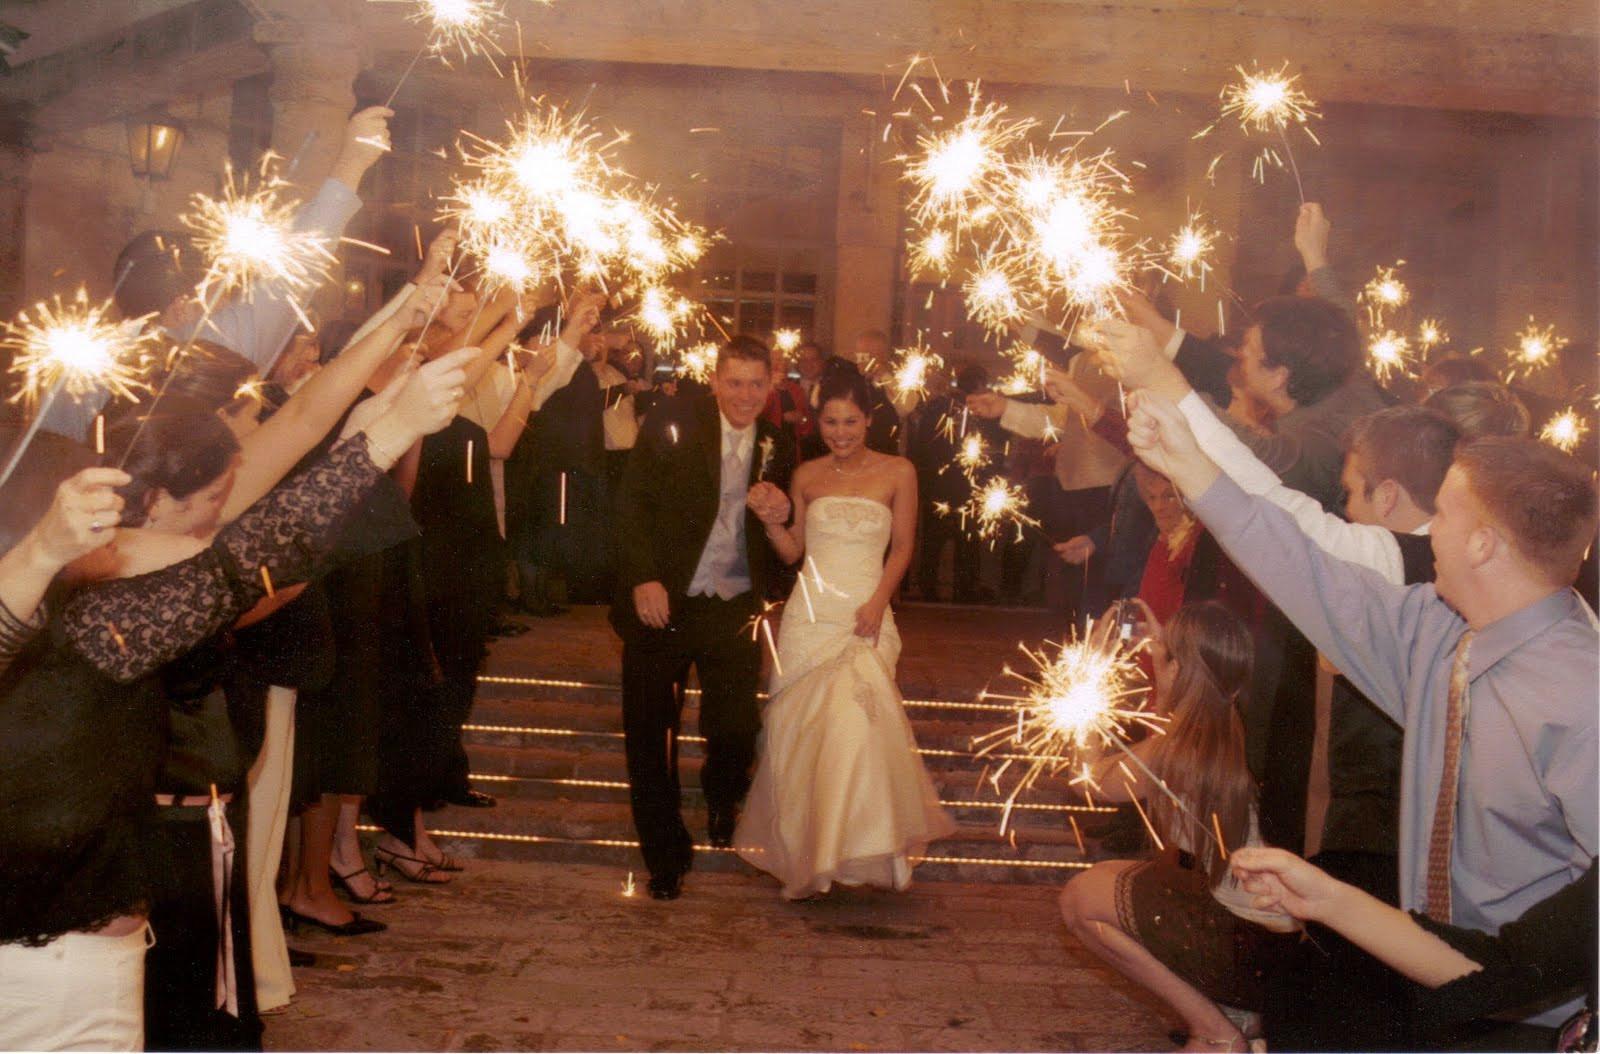 Wedding Sparkler  Wedding sparklers Lighting up the party